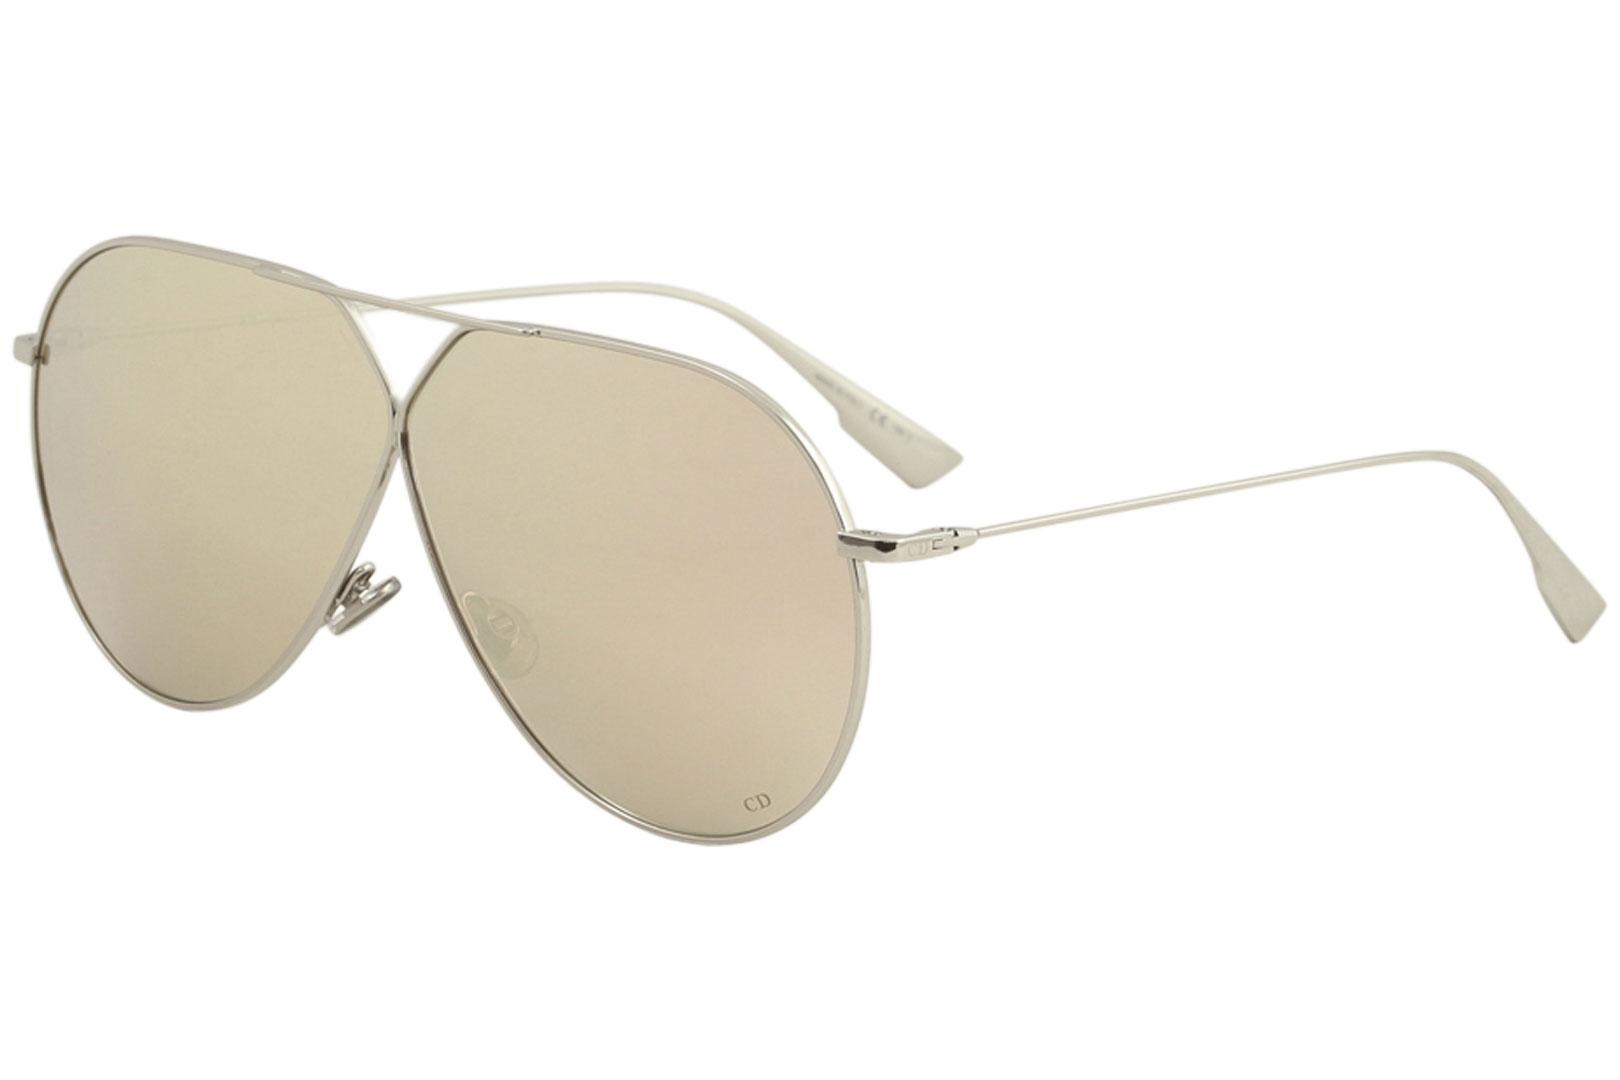 Image of Christian Dior Women's DiorStellaire3 Fashion Pilot Sunglasses - Palladium/Pink Gold Mirror   010/SQ - Lens 65 Bridge 01 B 55.8 ED 71.9 Temple 145mm